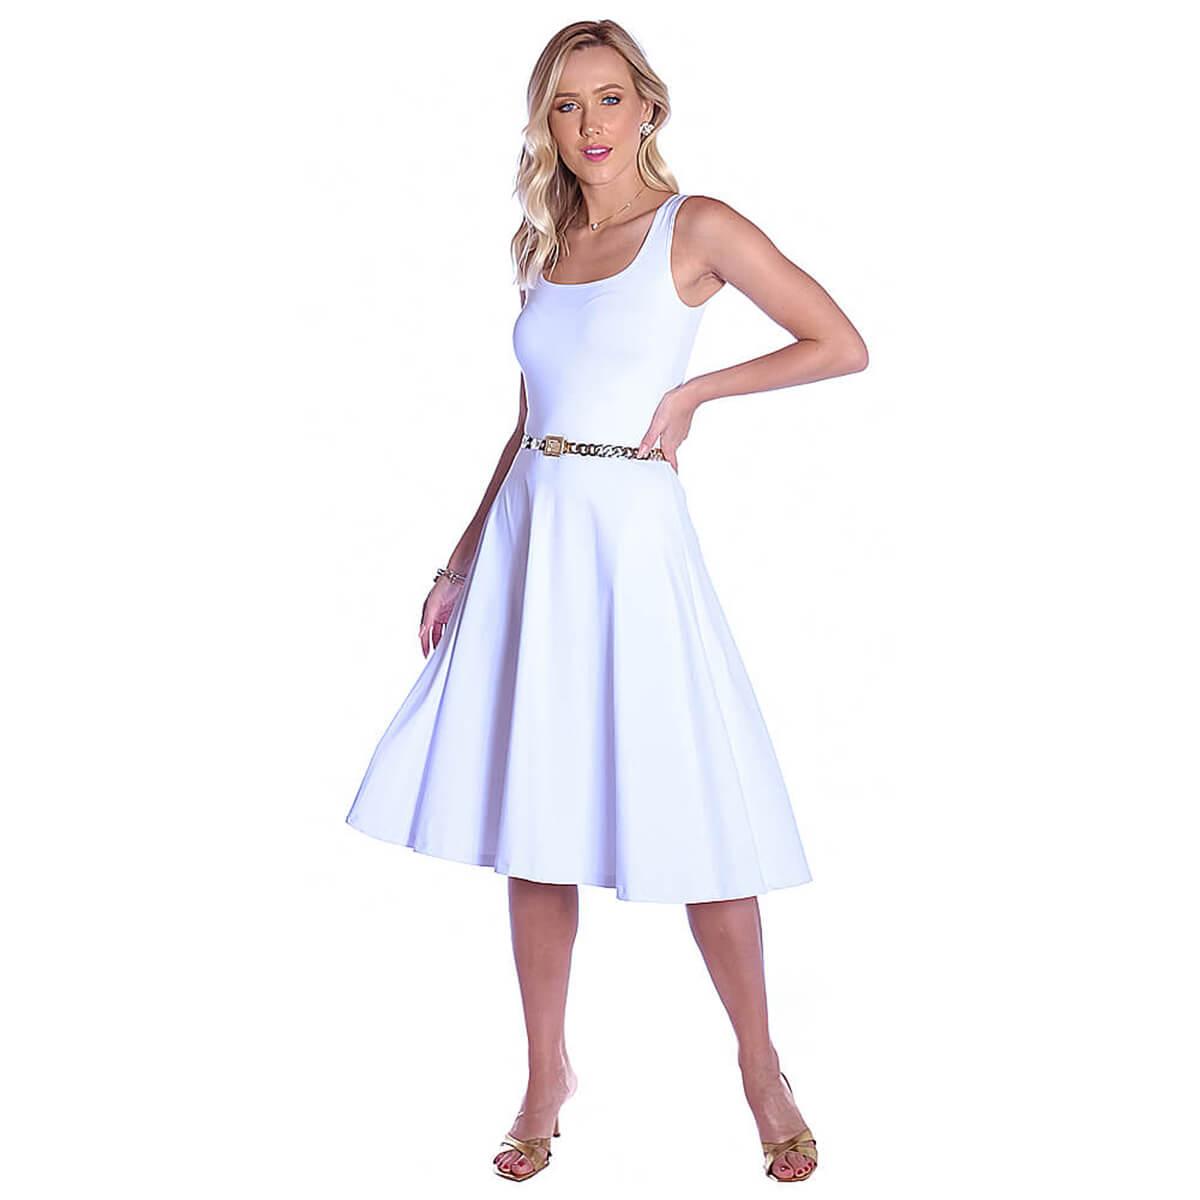 Vestido Branco FICALINDA Regata Decote Redondo